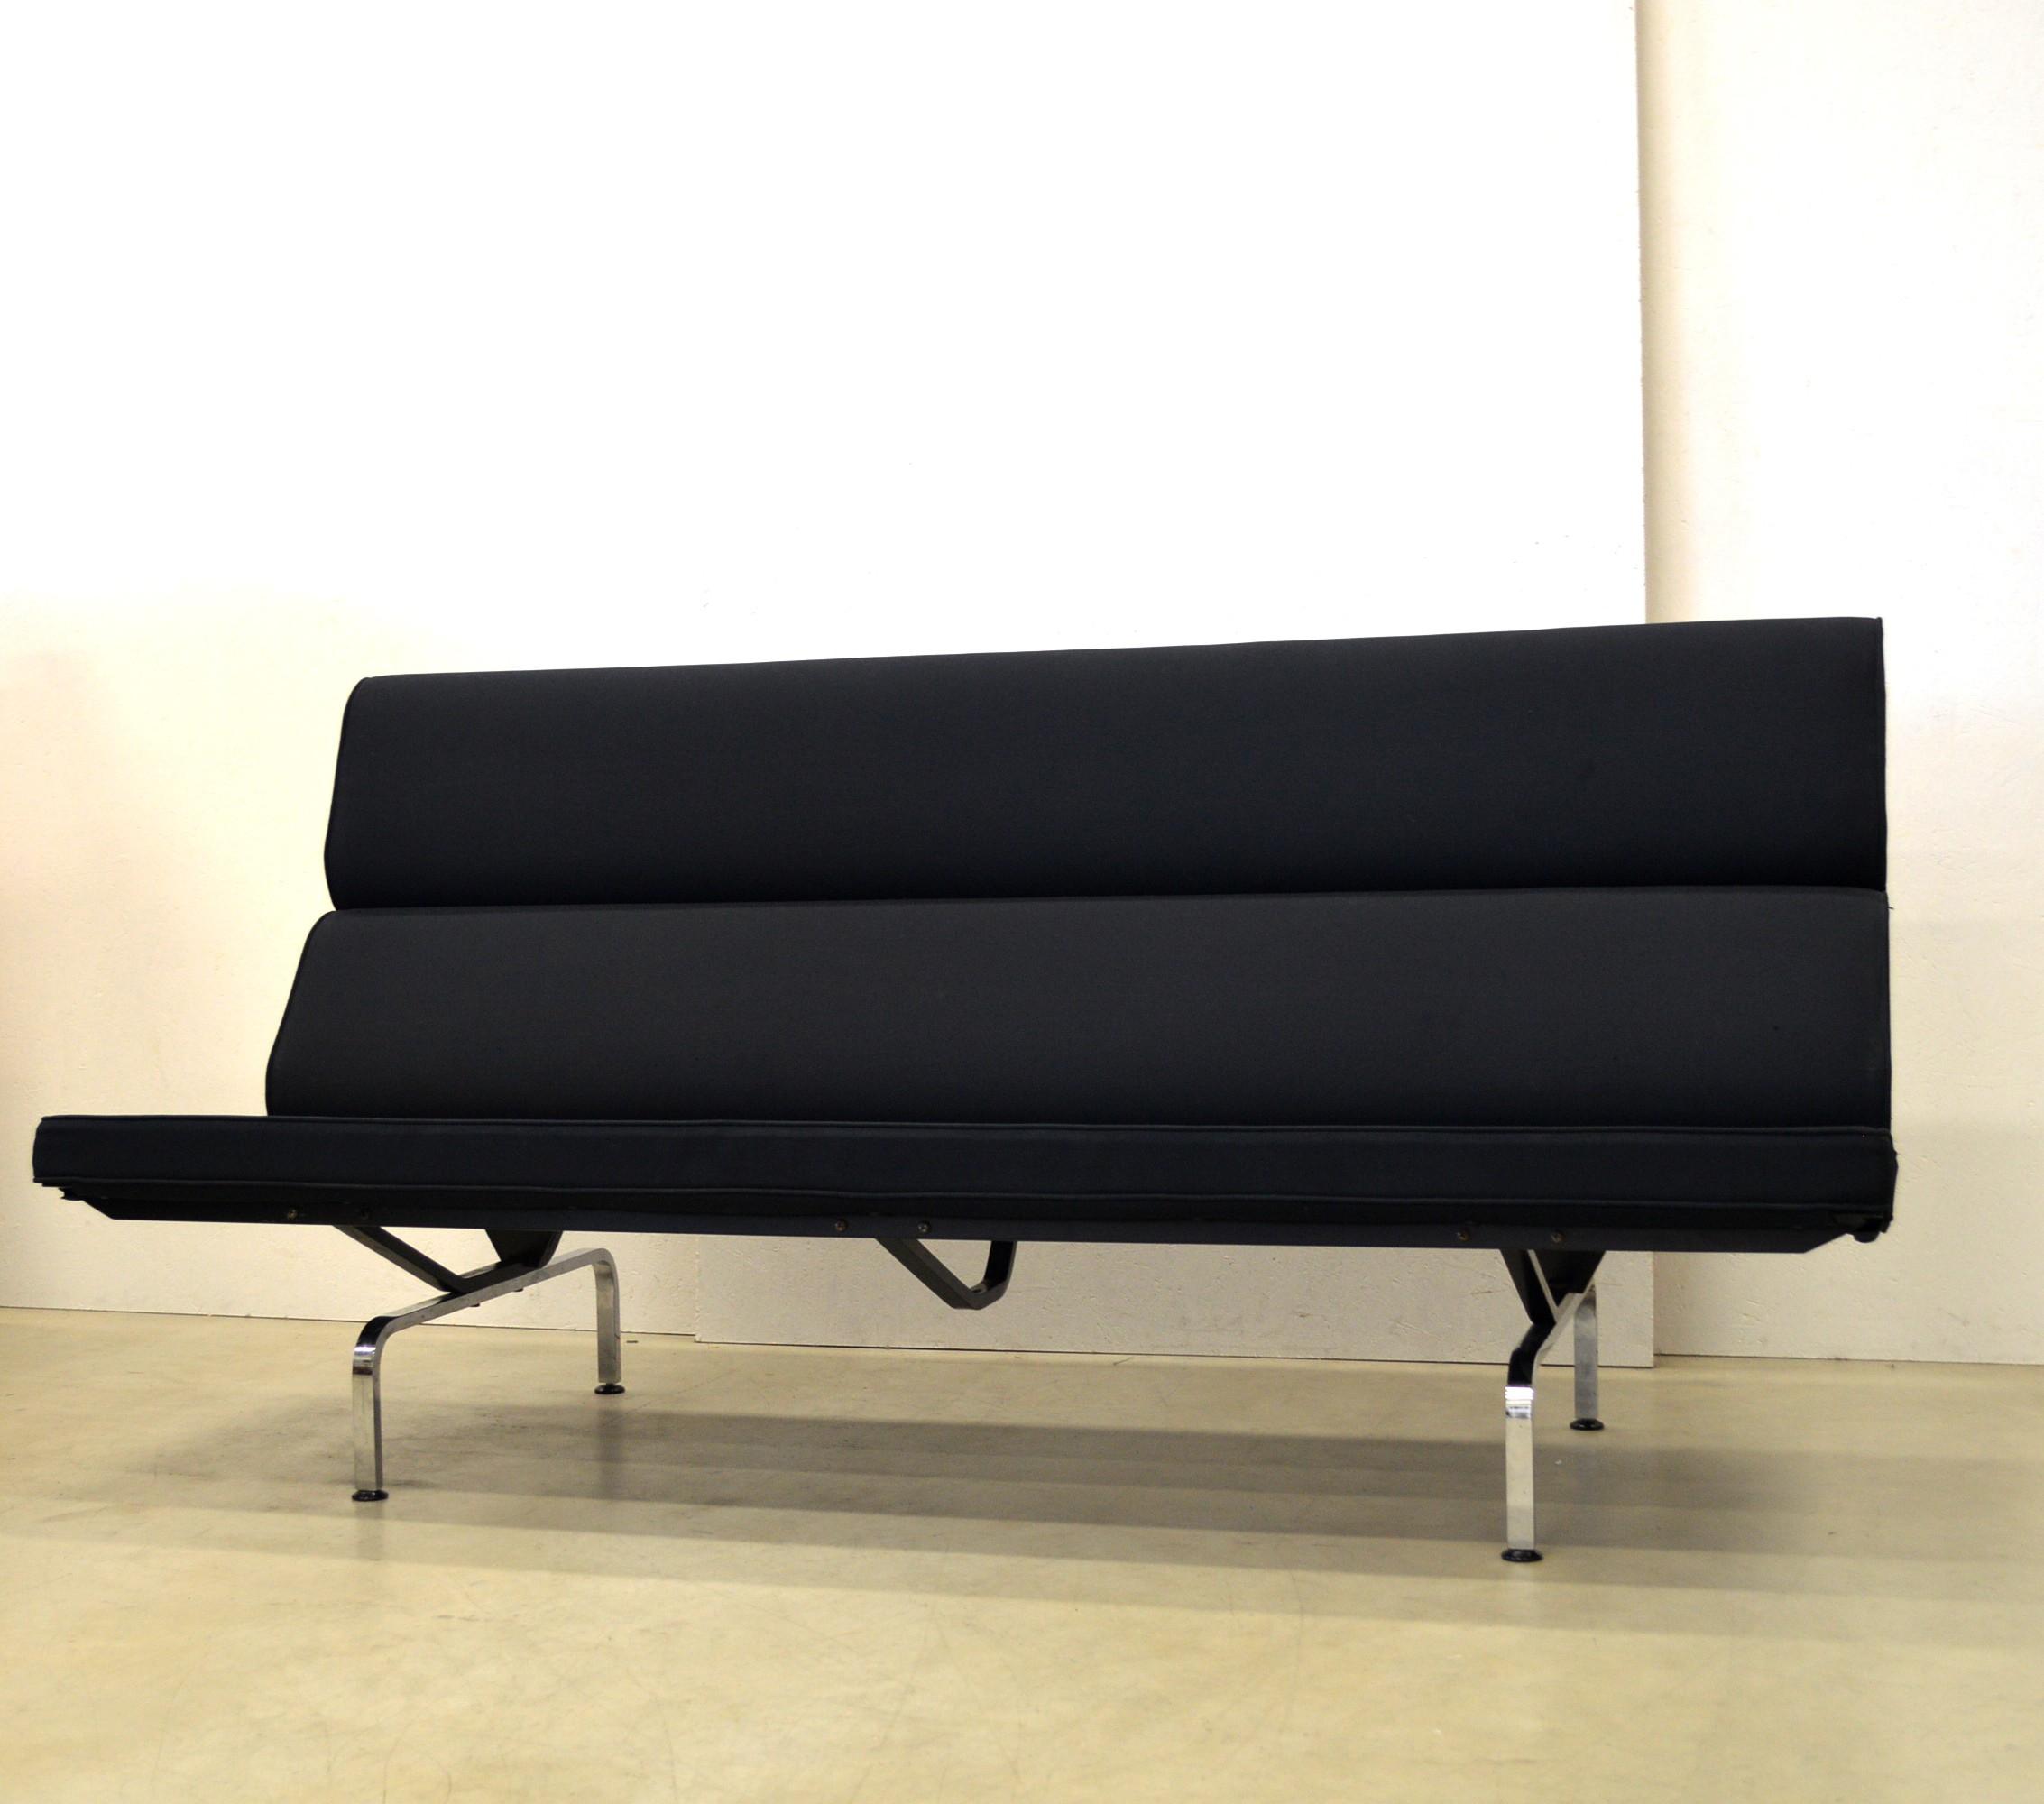 eames sofa compact brompton next reviews lounge seating herman